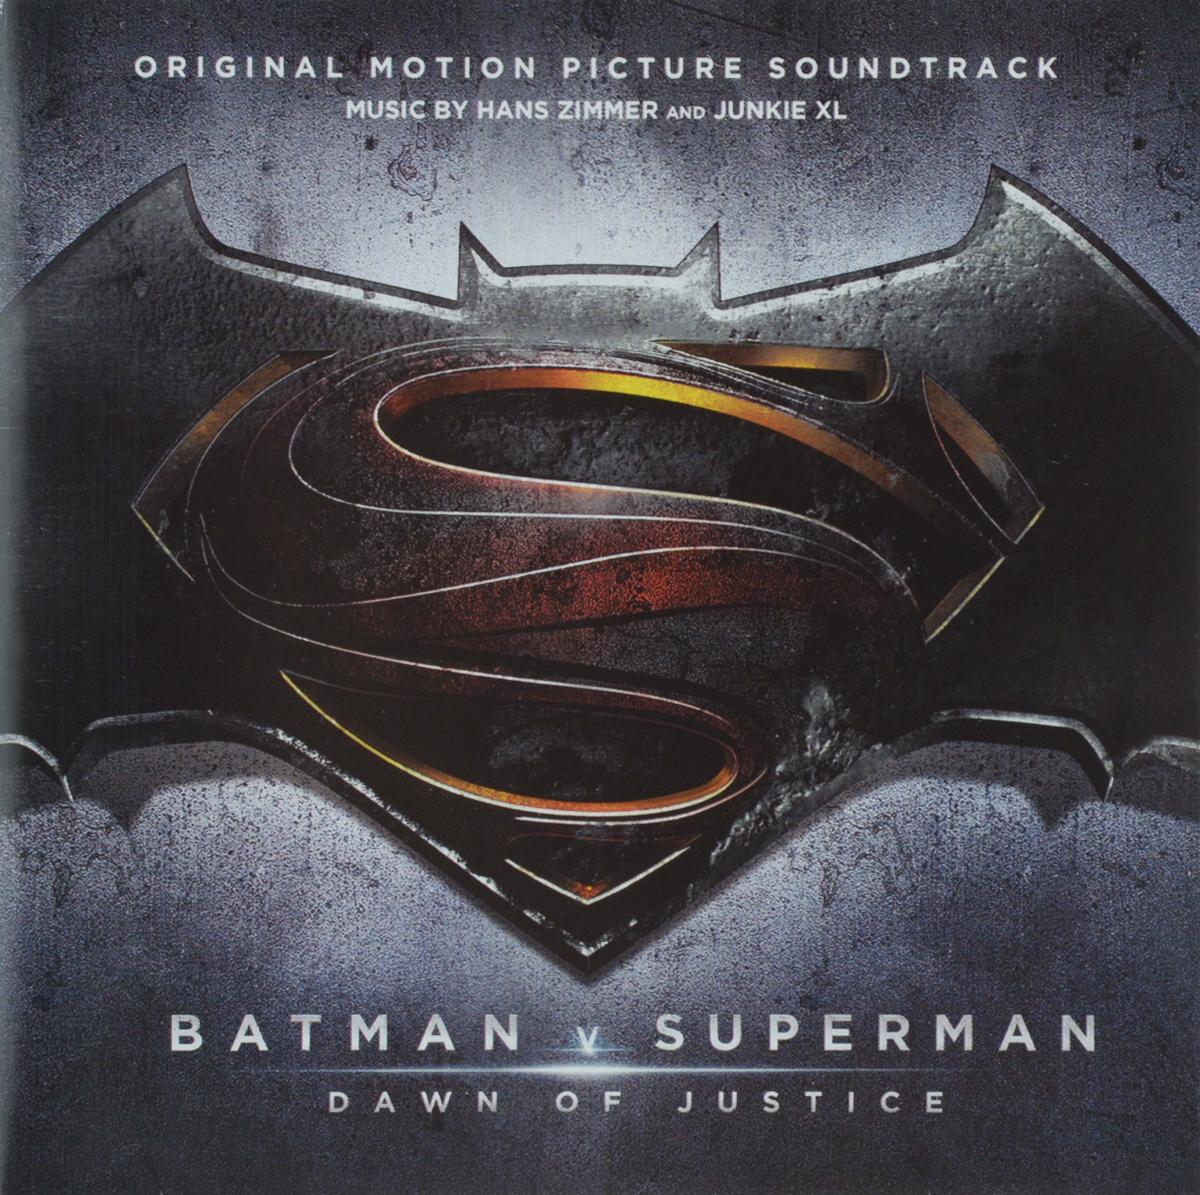 Hans Zimmer, Junkie XL. Batman V Superman. Dawn Of Justice. Original Motion Picture Soundtrack